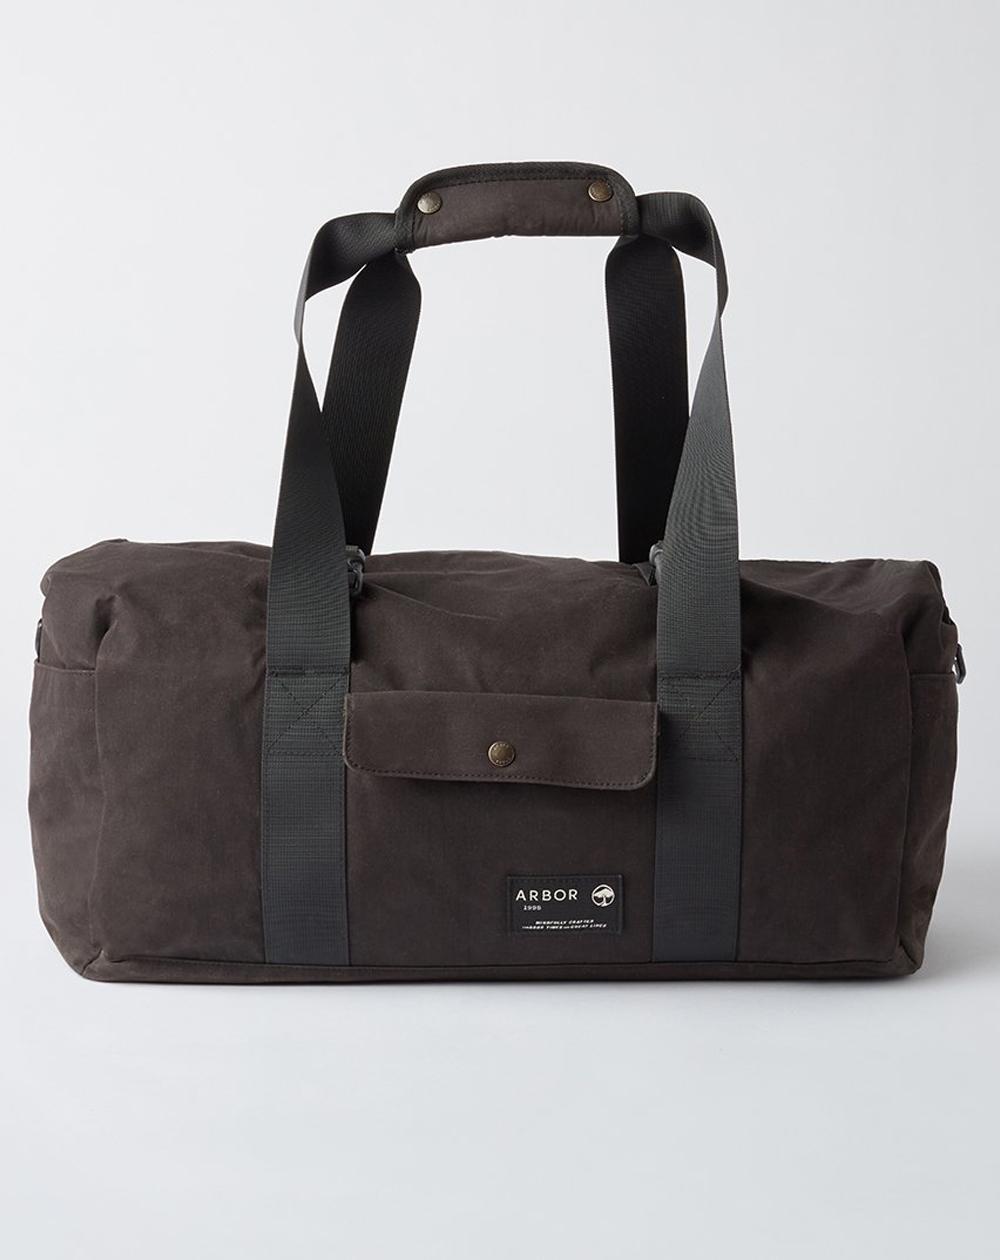 Arbor Up Cargo Duffle Vintage Black